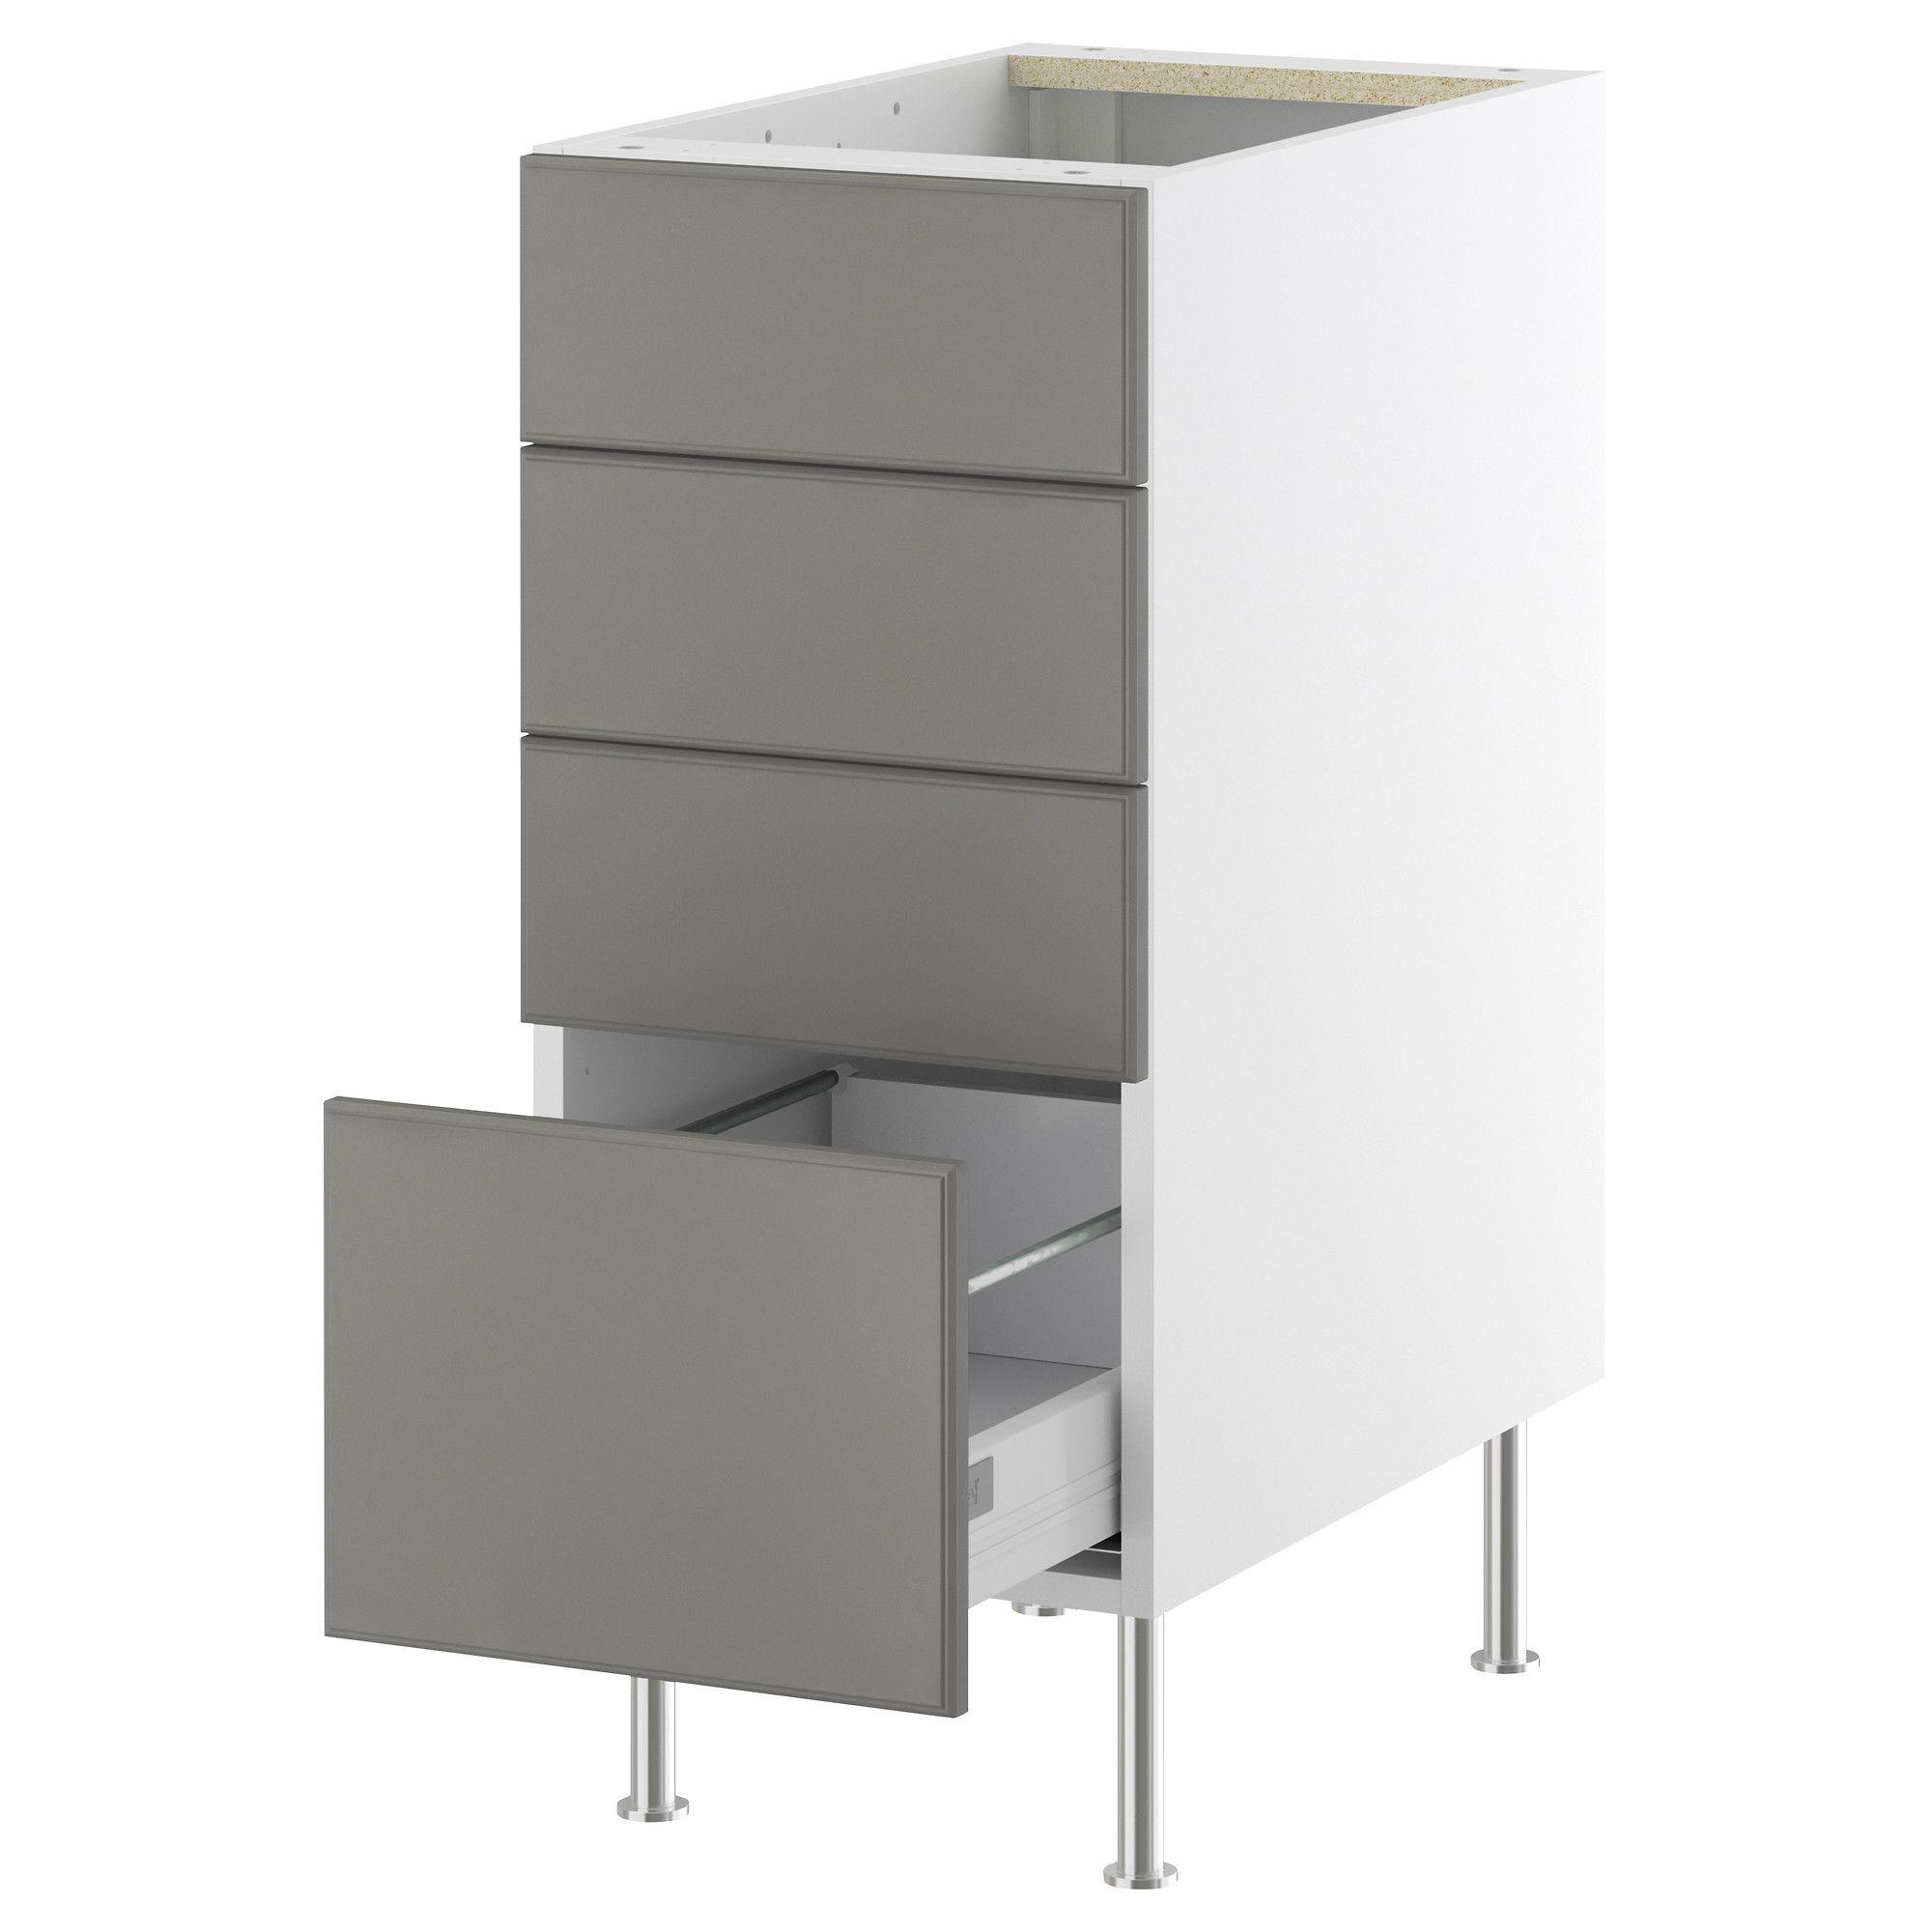 Interior Akurum Base Cabinet akurum base cabinet with 4 drawers white lidi gray 15 and 18 18